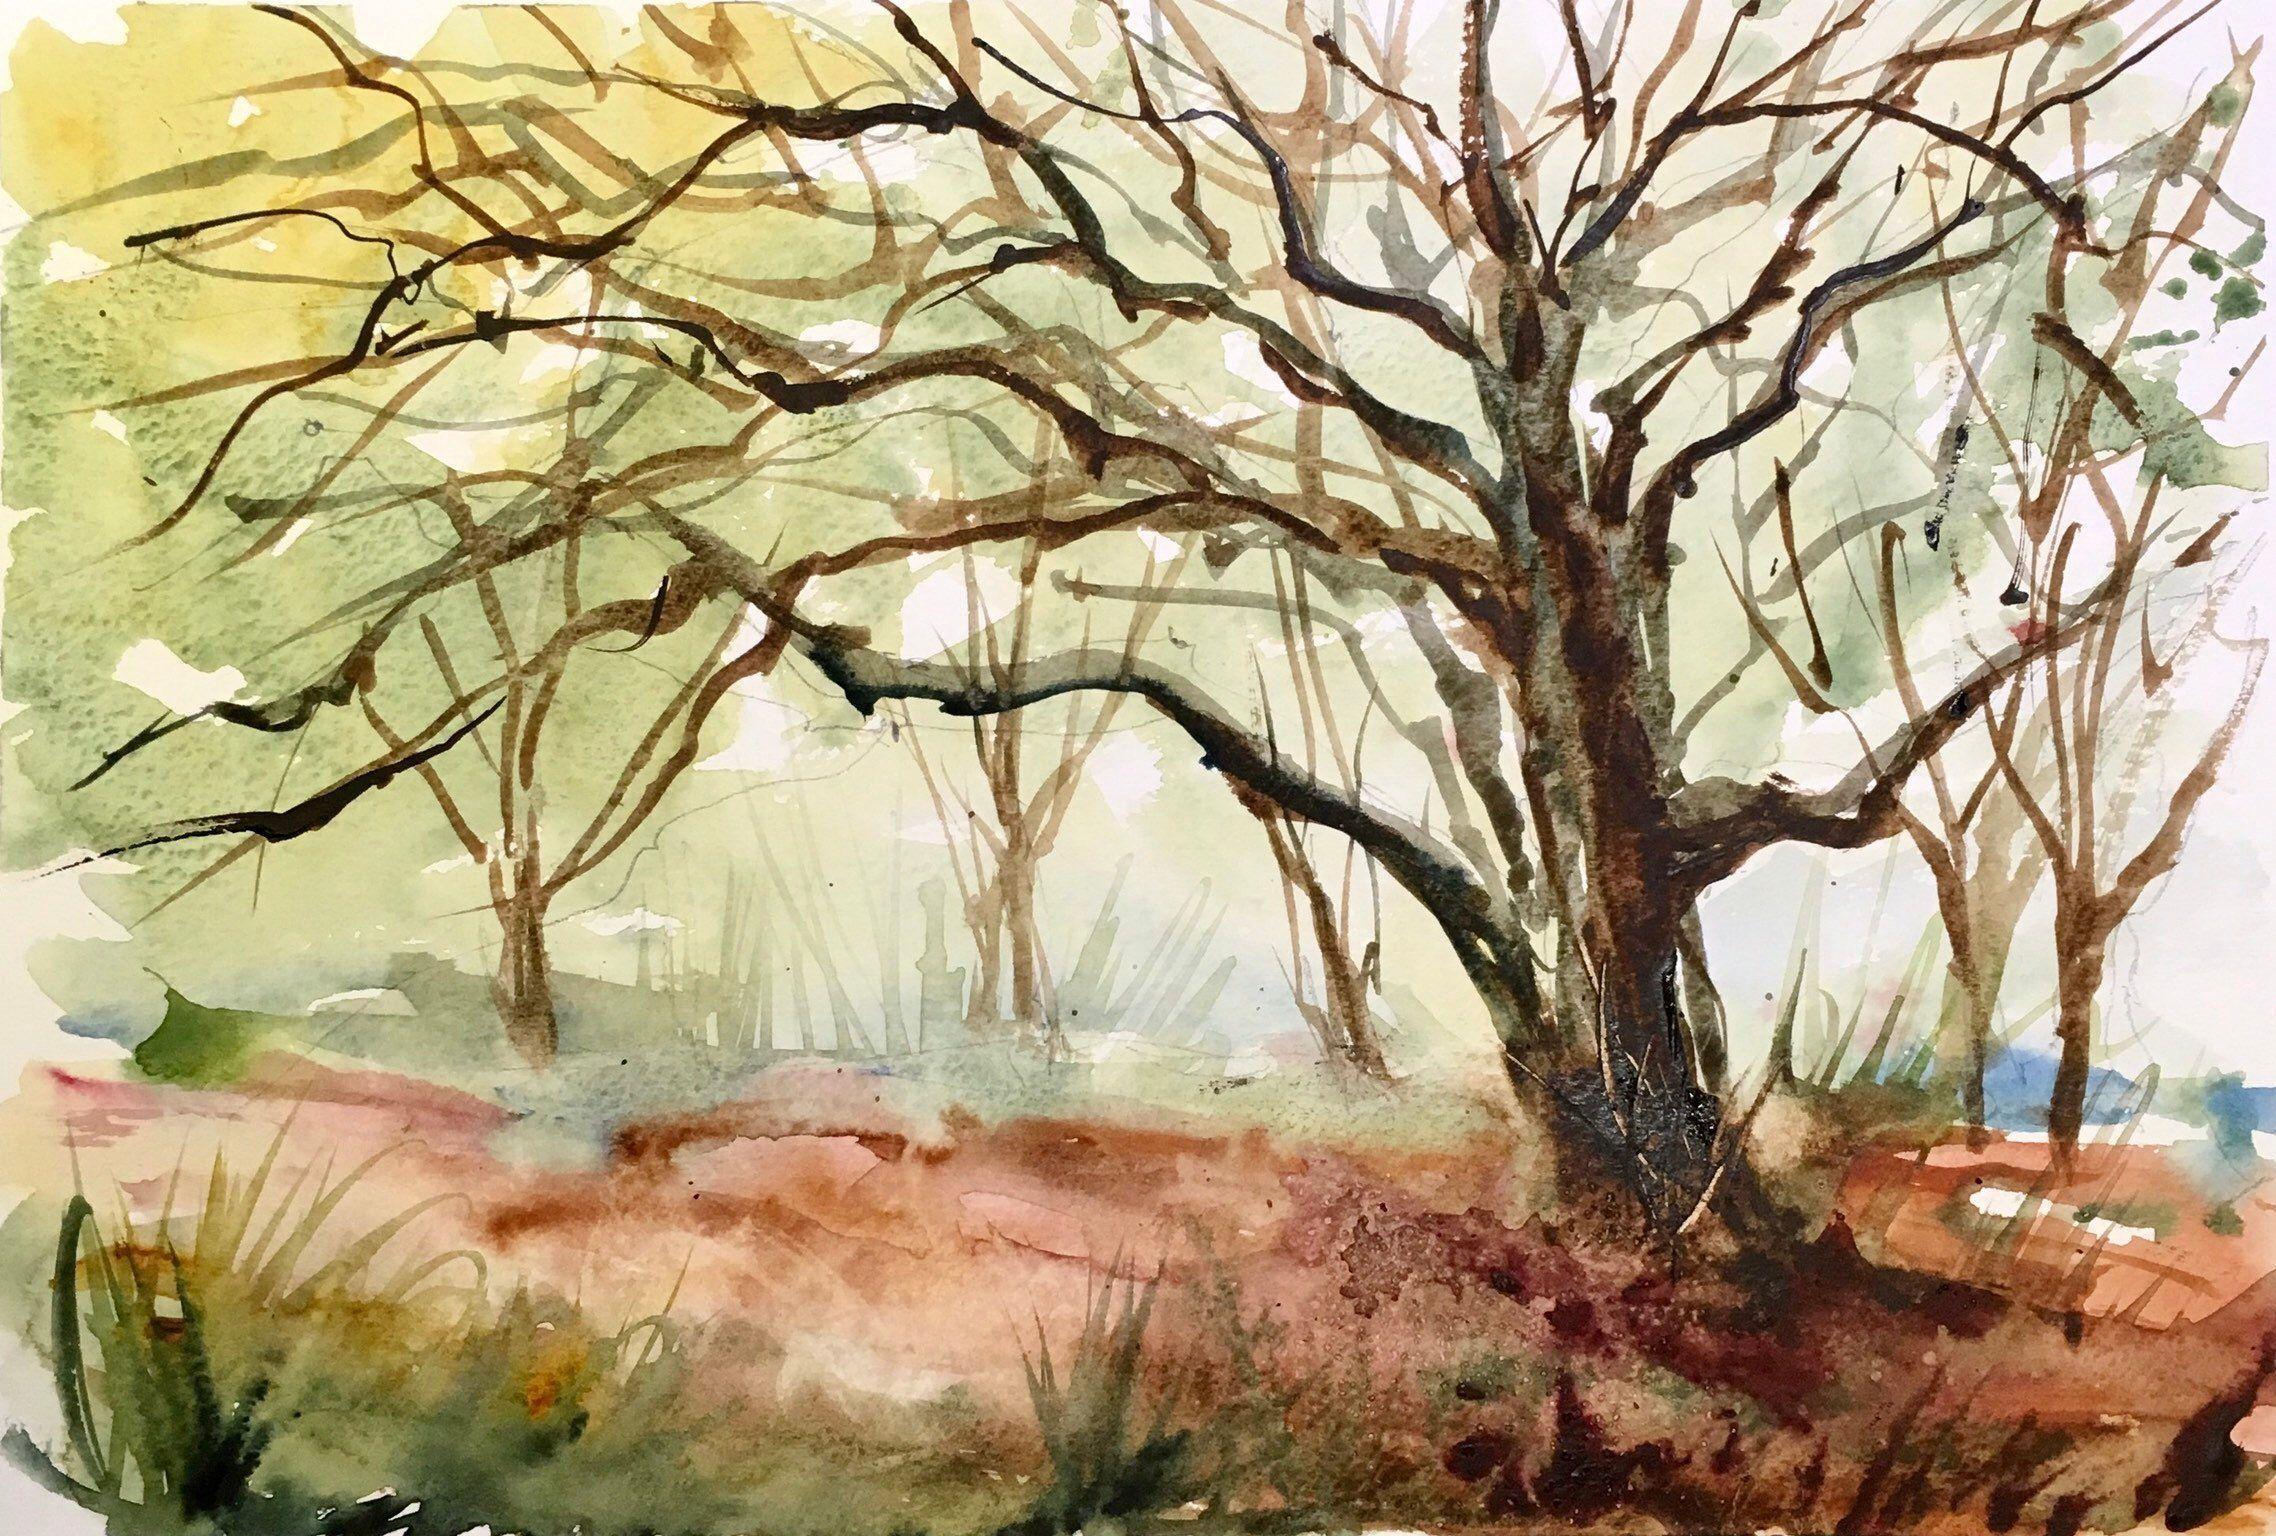 Aquarelle Peinture Originale Arbre En Automne Woodland Fall